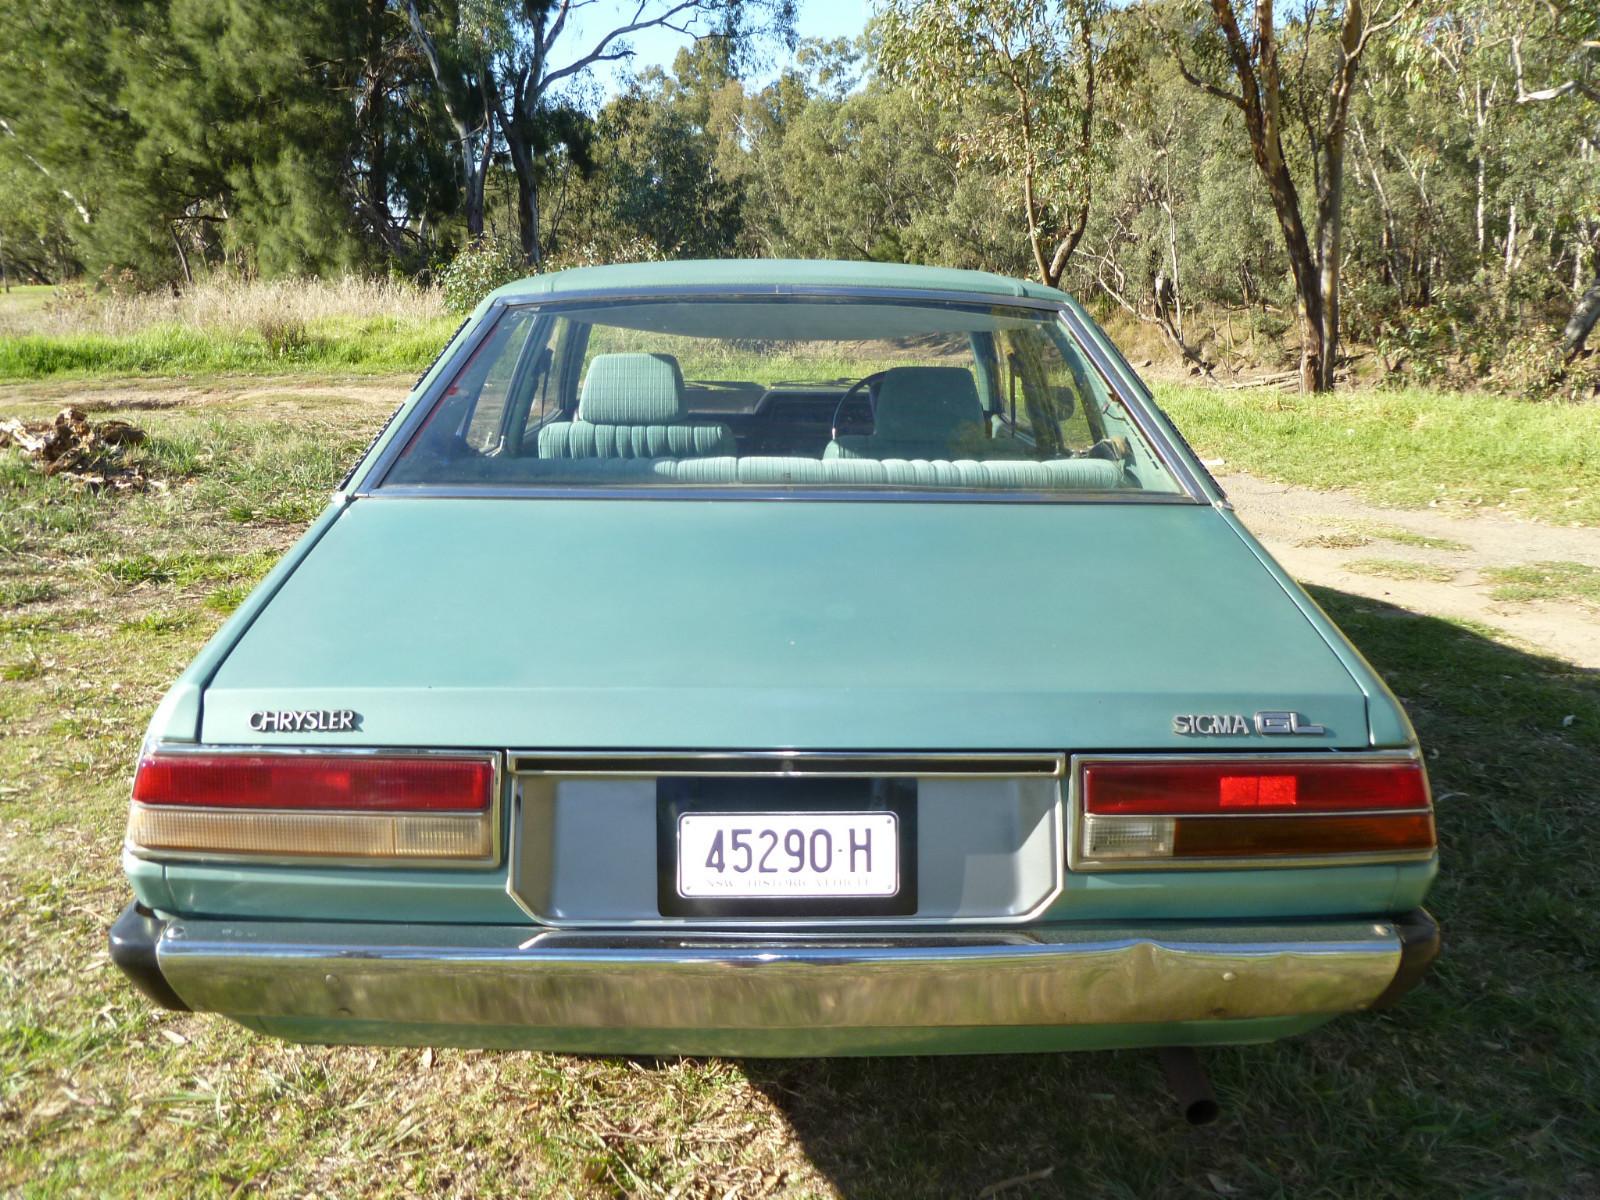 Galant-Sigma.com: For Sale: green 1979 Chrysler Sigma GL automatic sedan